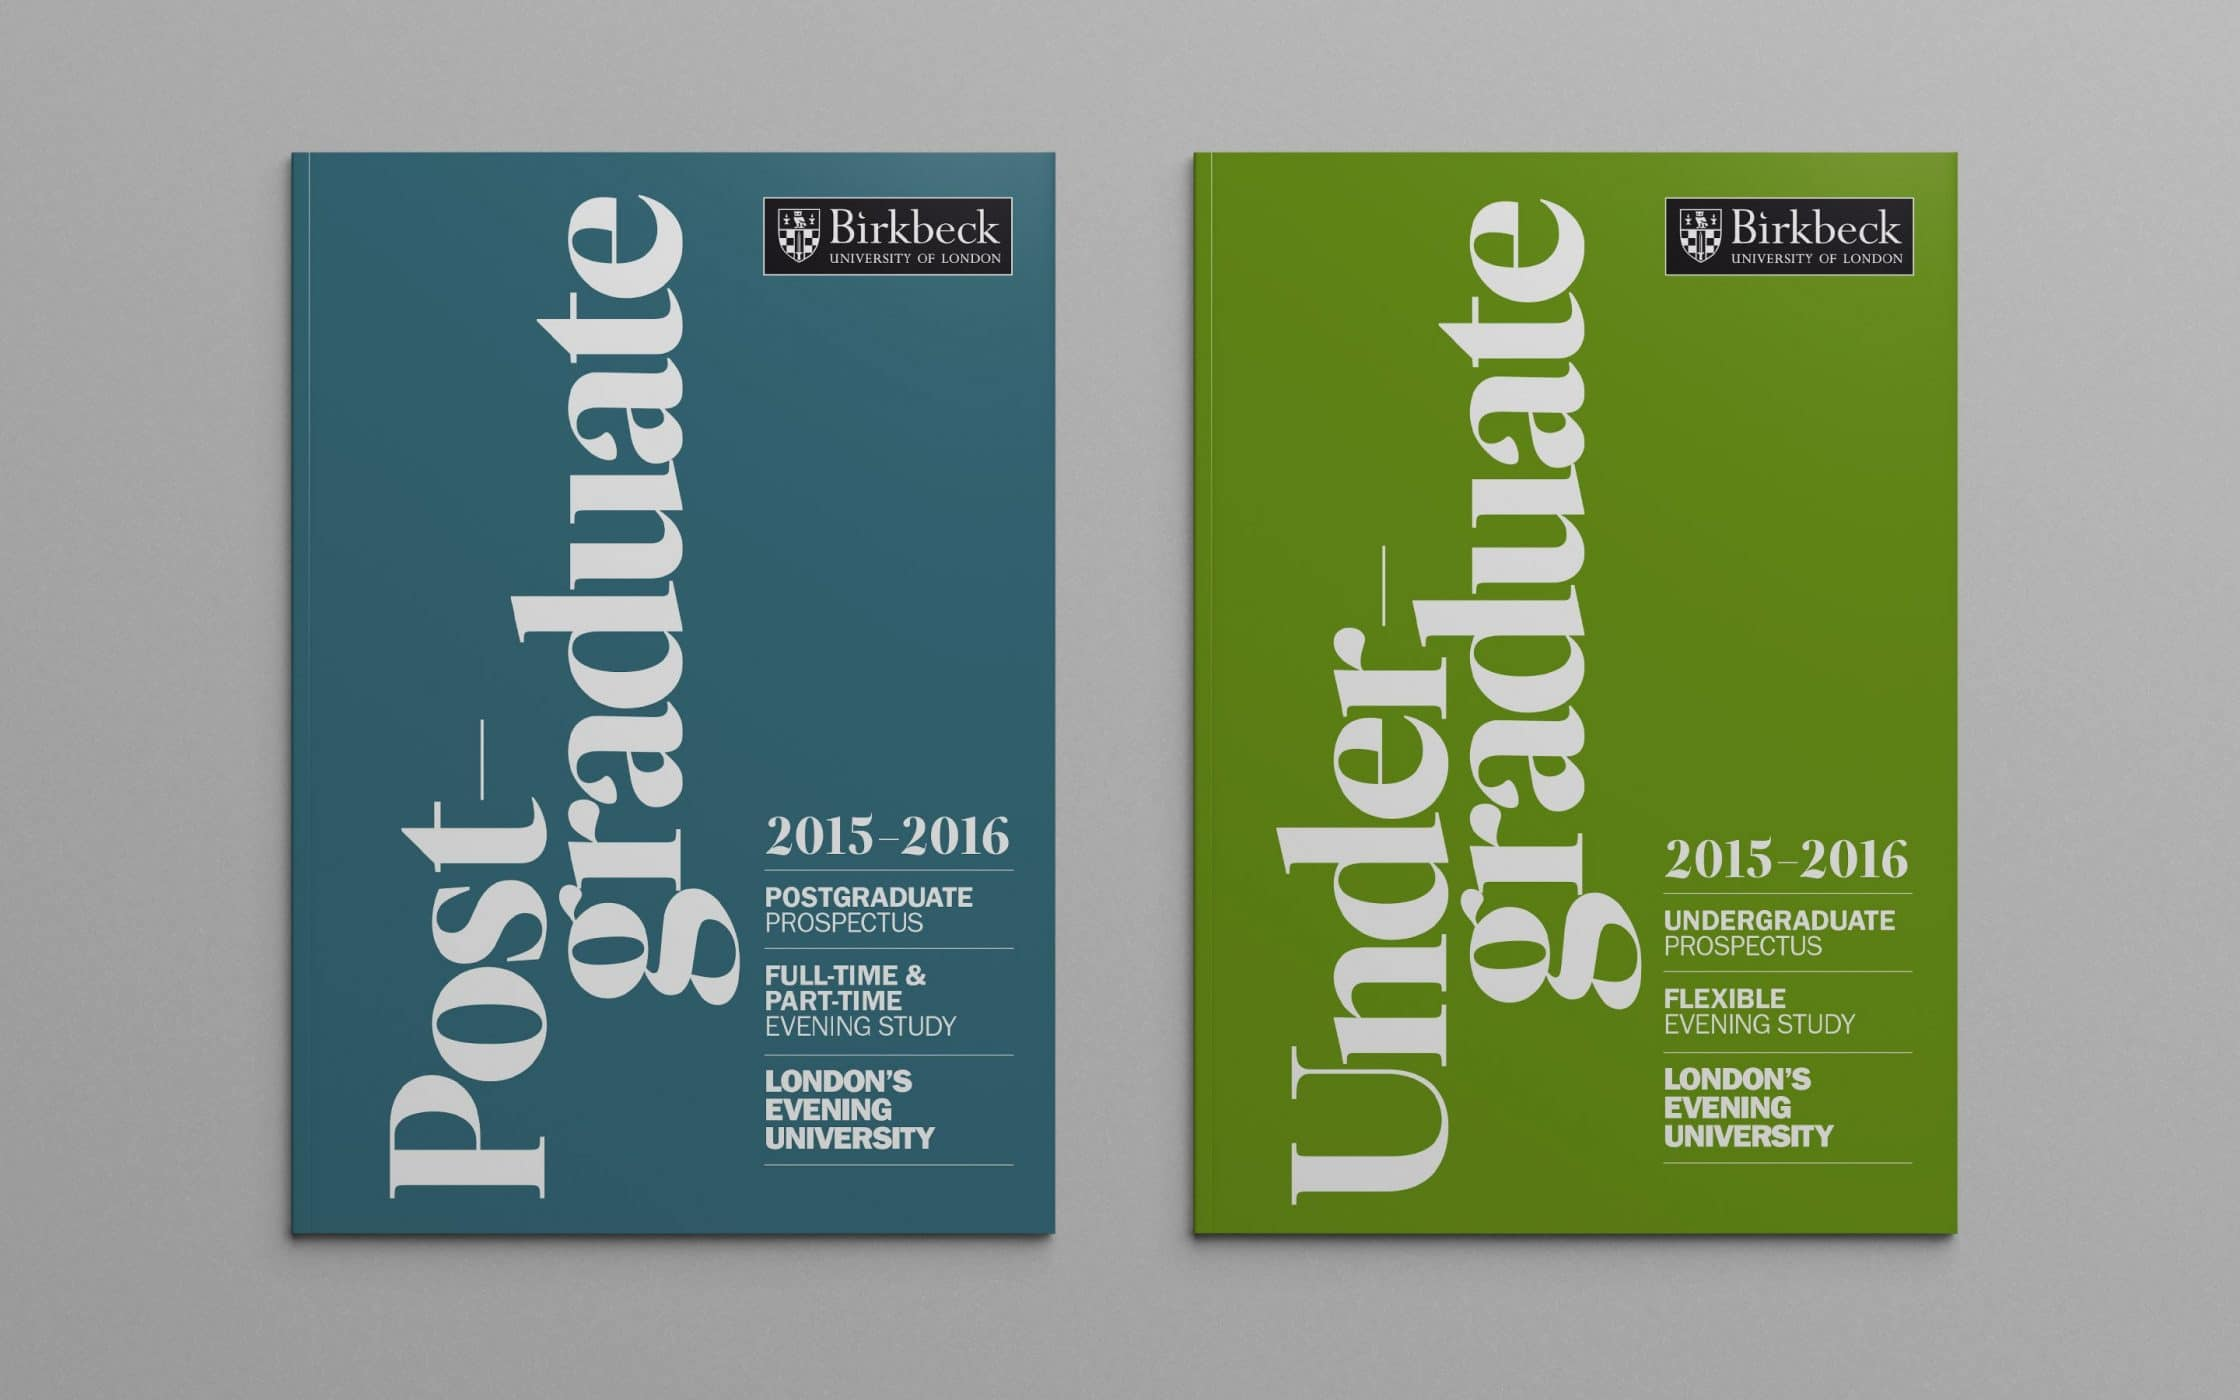 Birkbeck University Prospectus Design By Fabrik Brands London